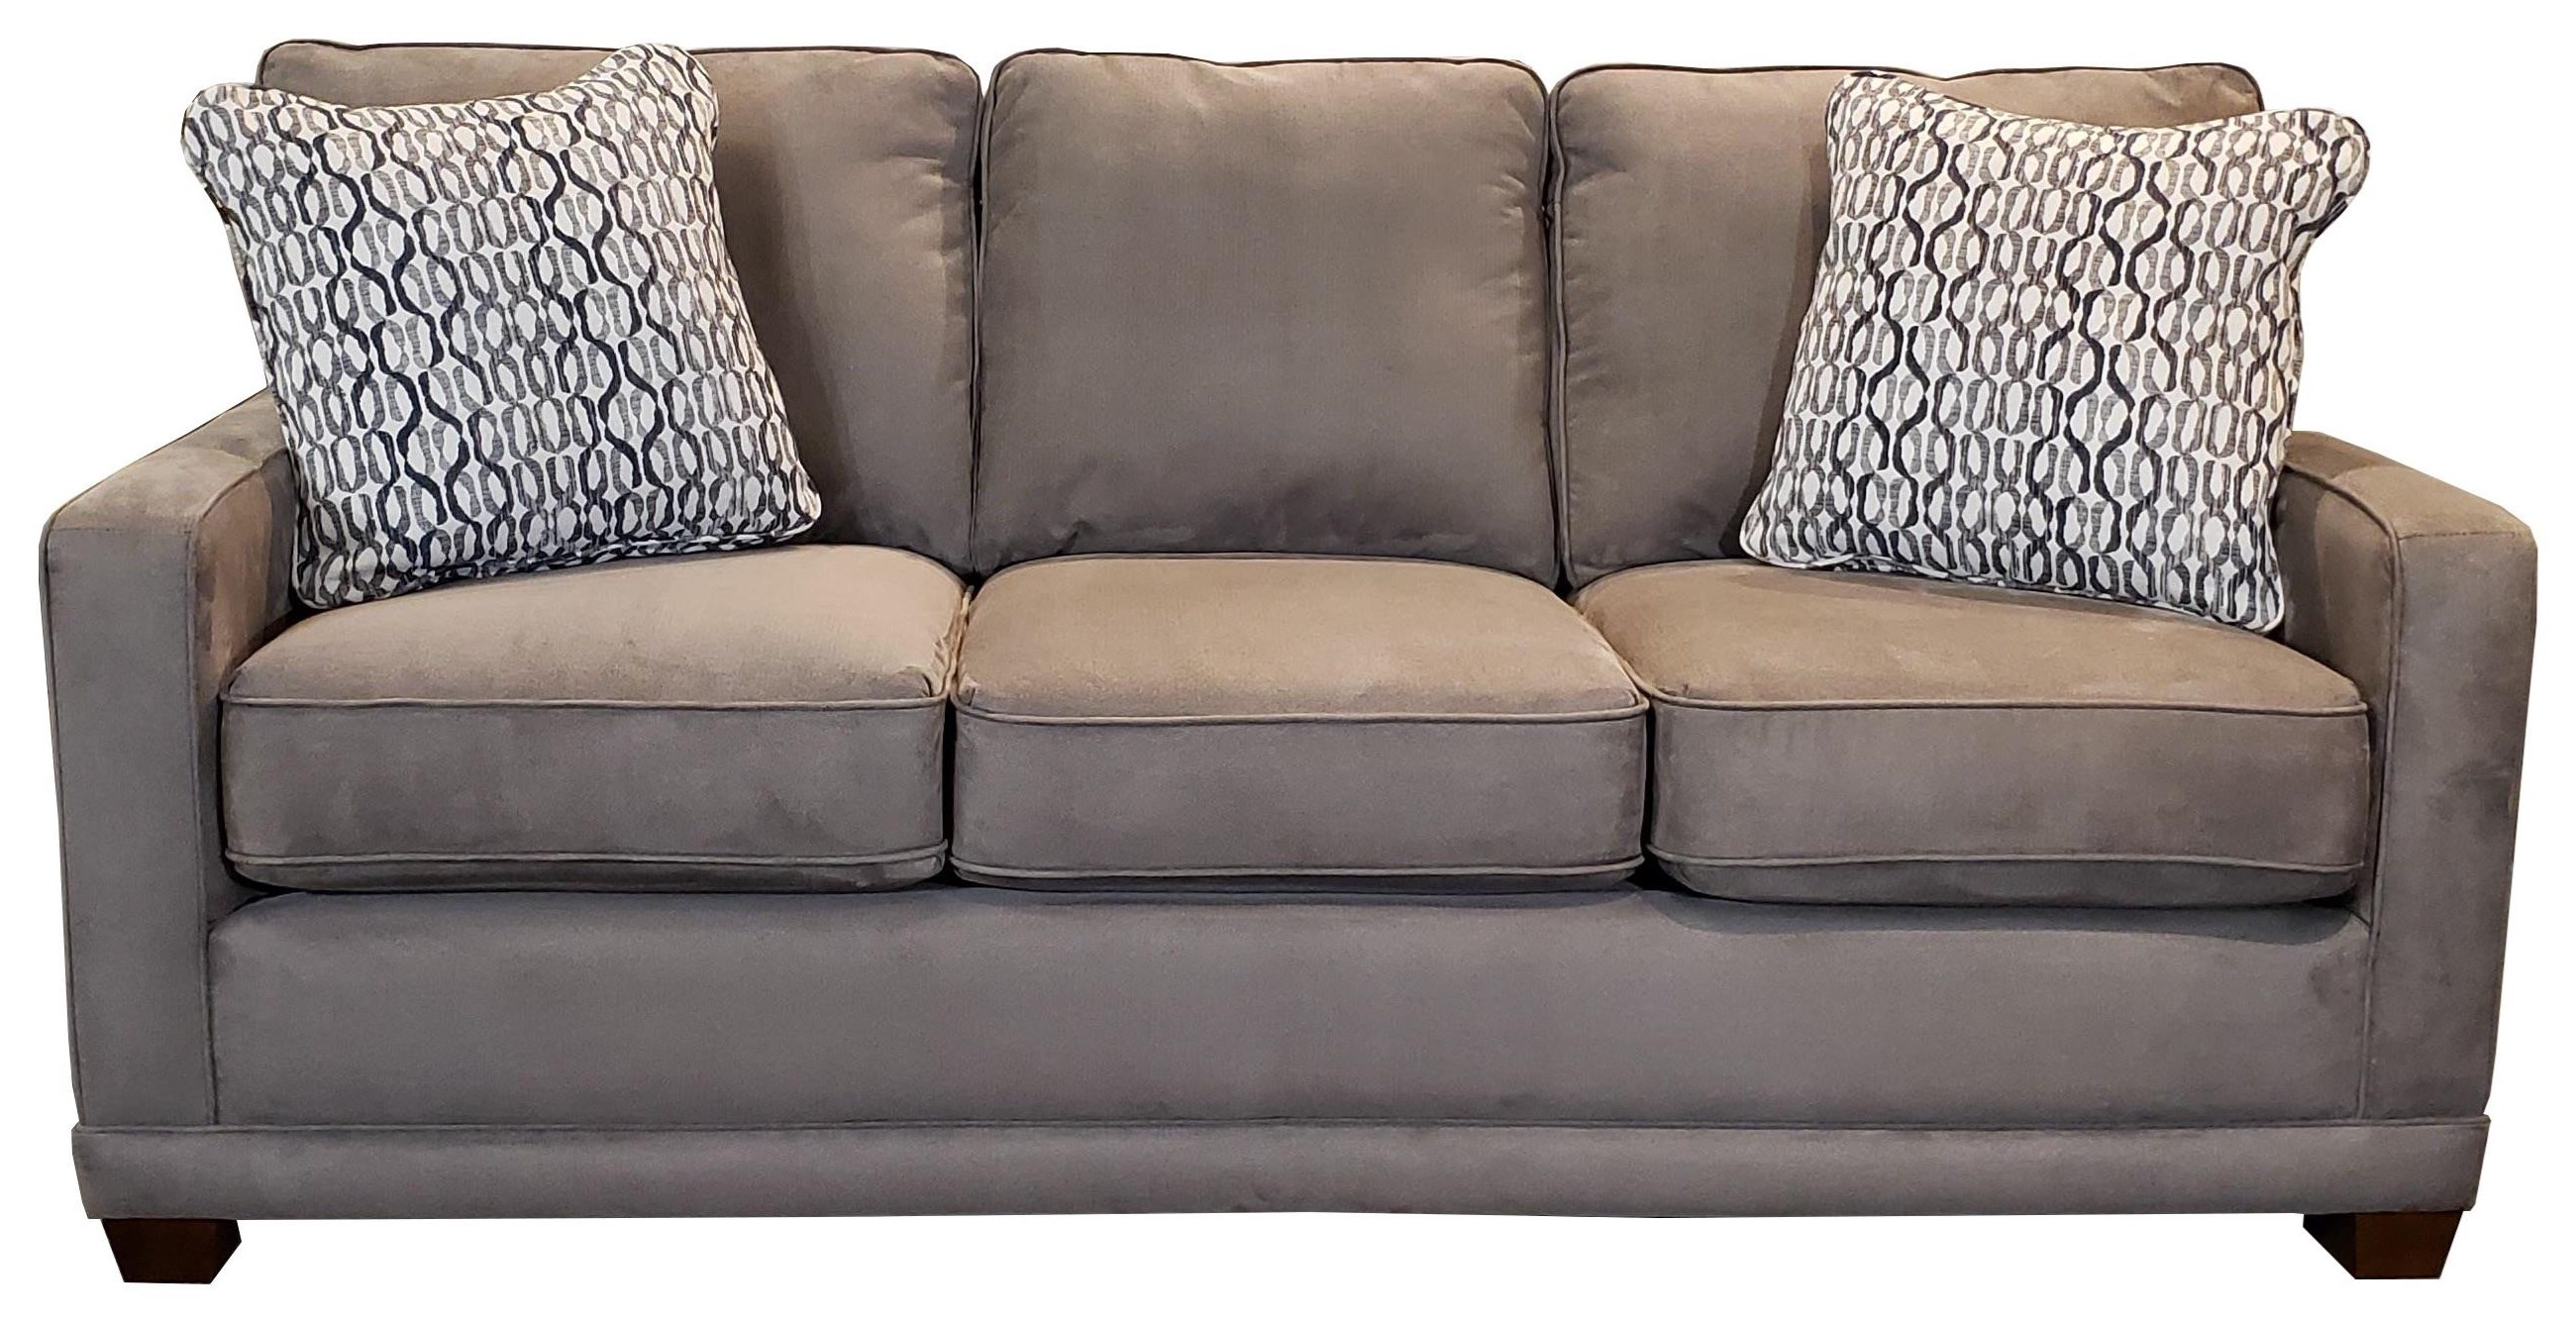 Kennedy Transitional Sofa by La-Z-Boy at Godby Home Furnishings